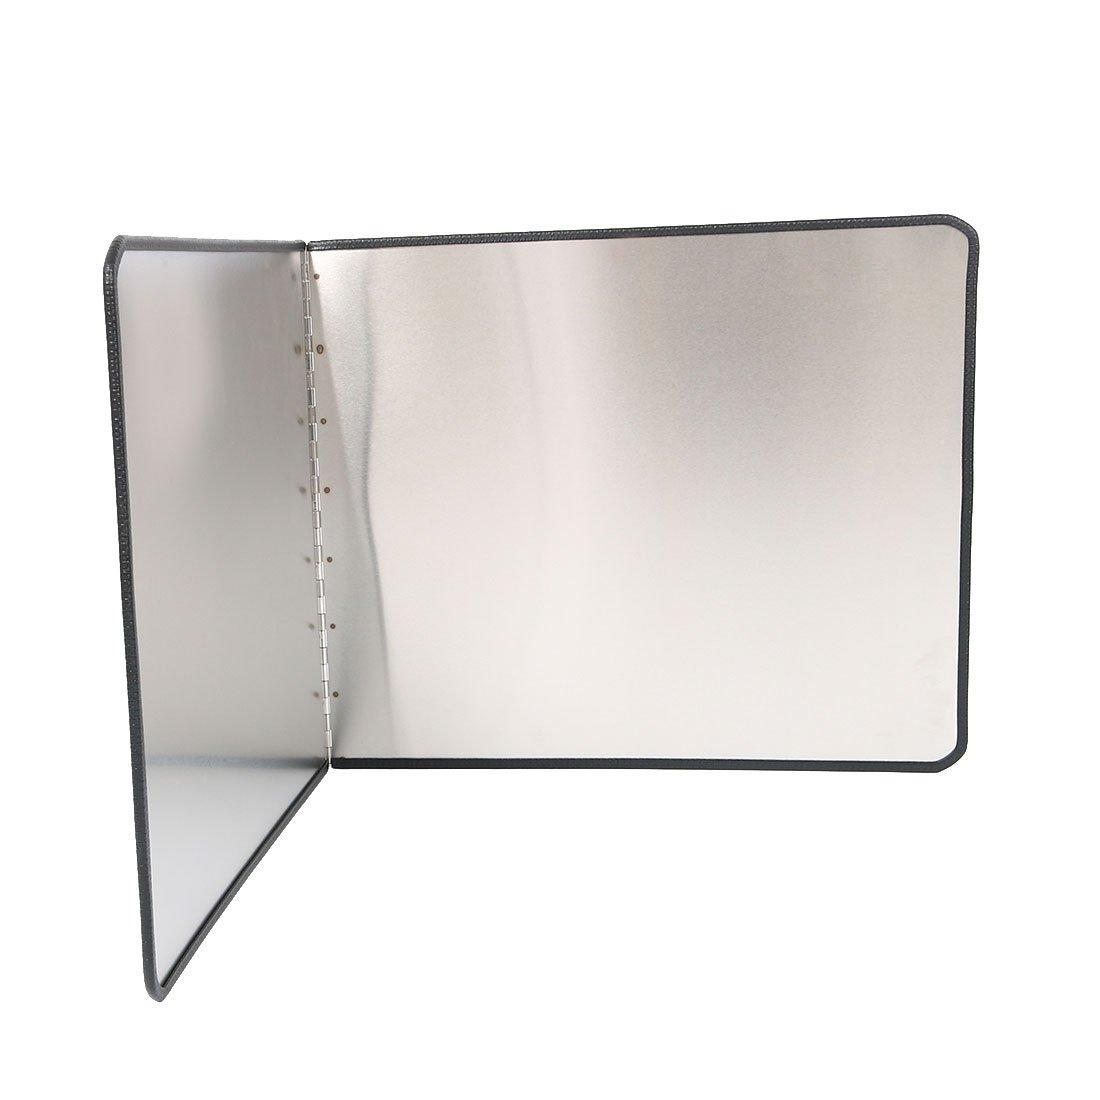 uxcell Oil Splash Guard, Stainless Steel Foldable Splatter Block for Frying Pan, Stove Shield, Kitchen Range Hood Wall Shield, 17.7'' x 15''(H) /45 x 38cm(H)